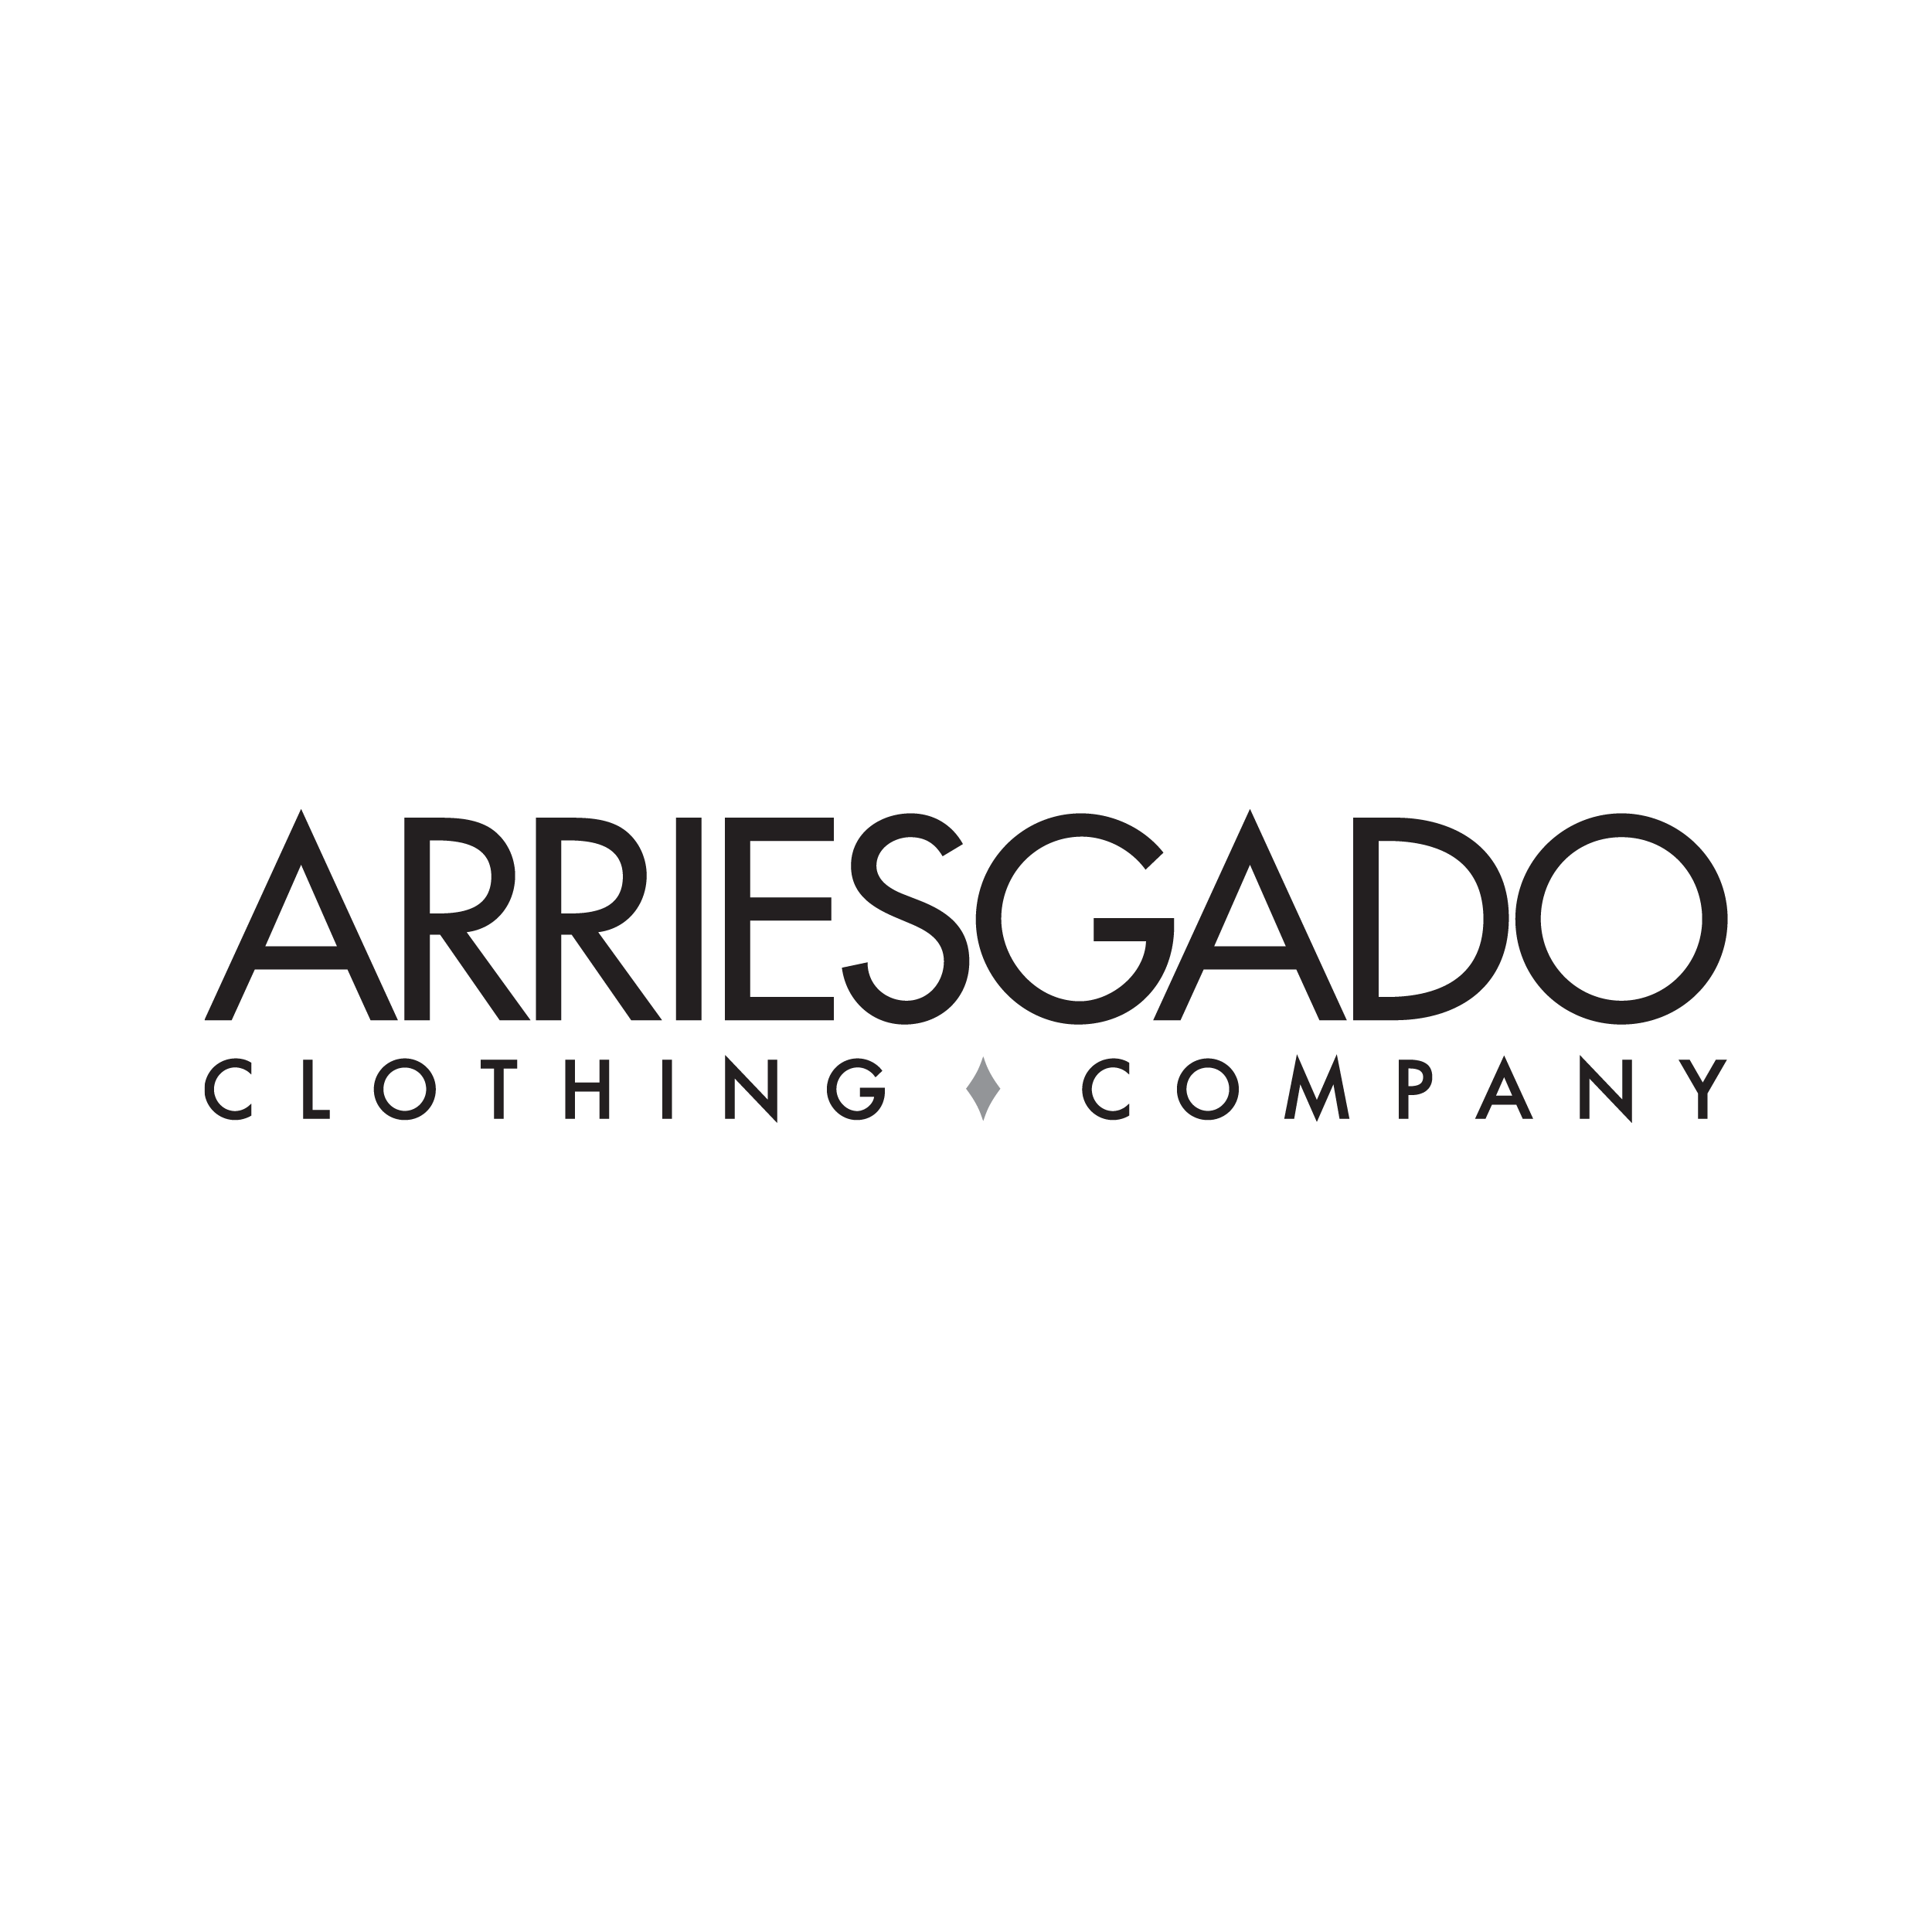 Arriesgado Clothing Company